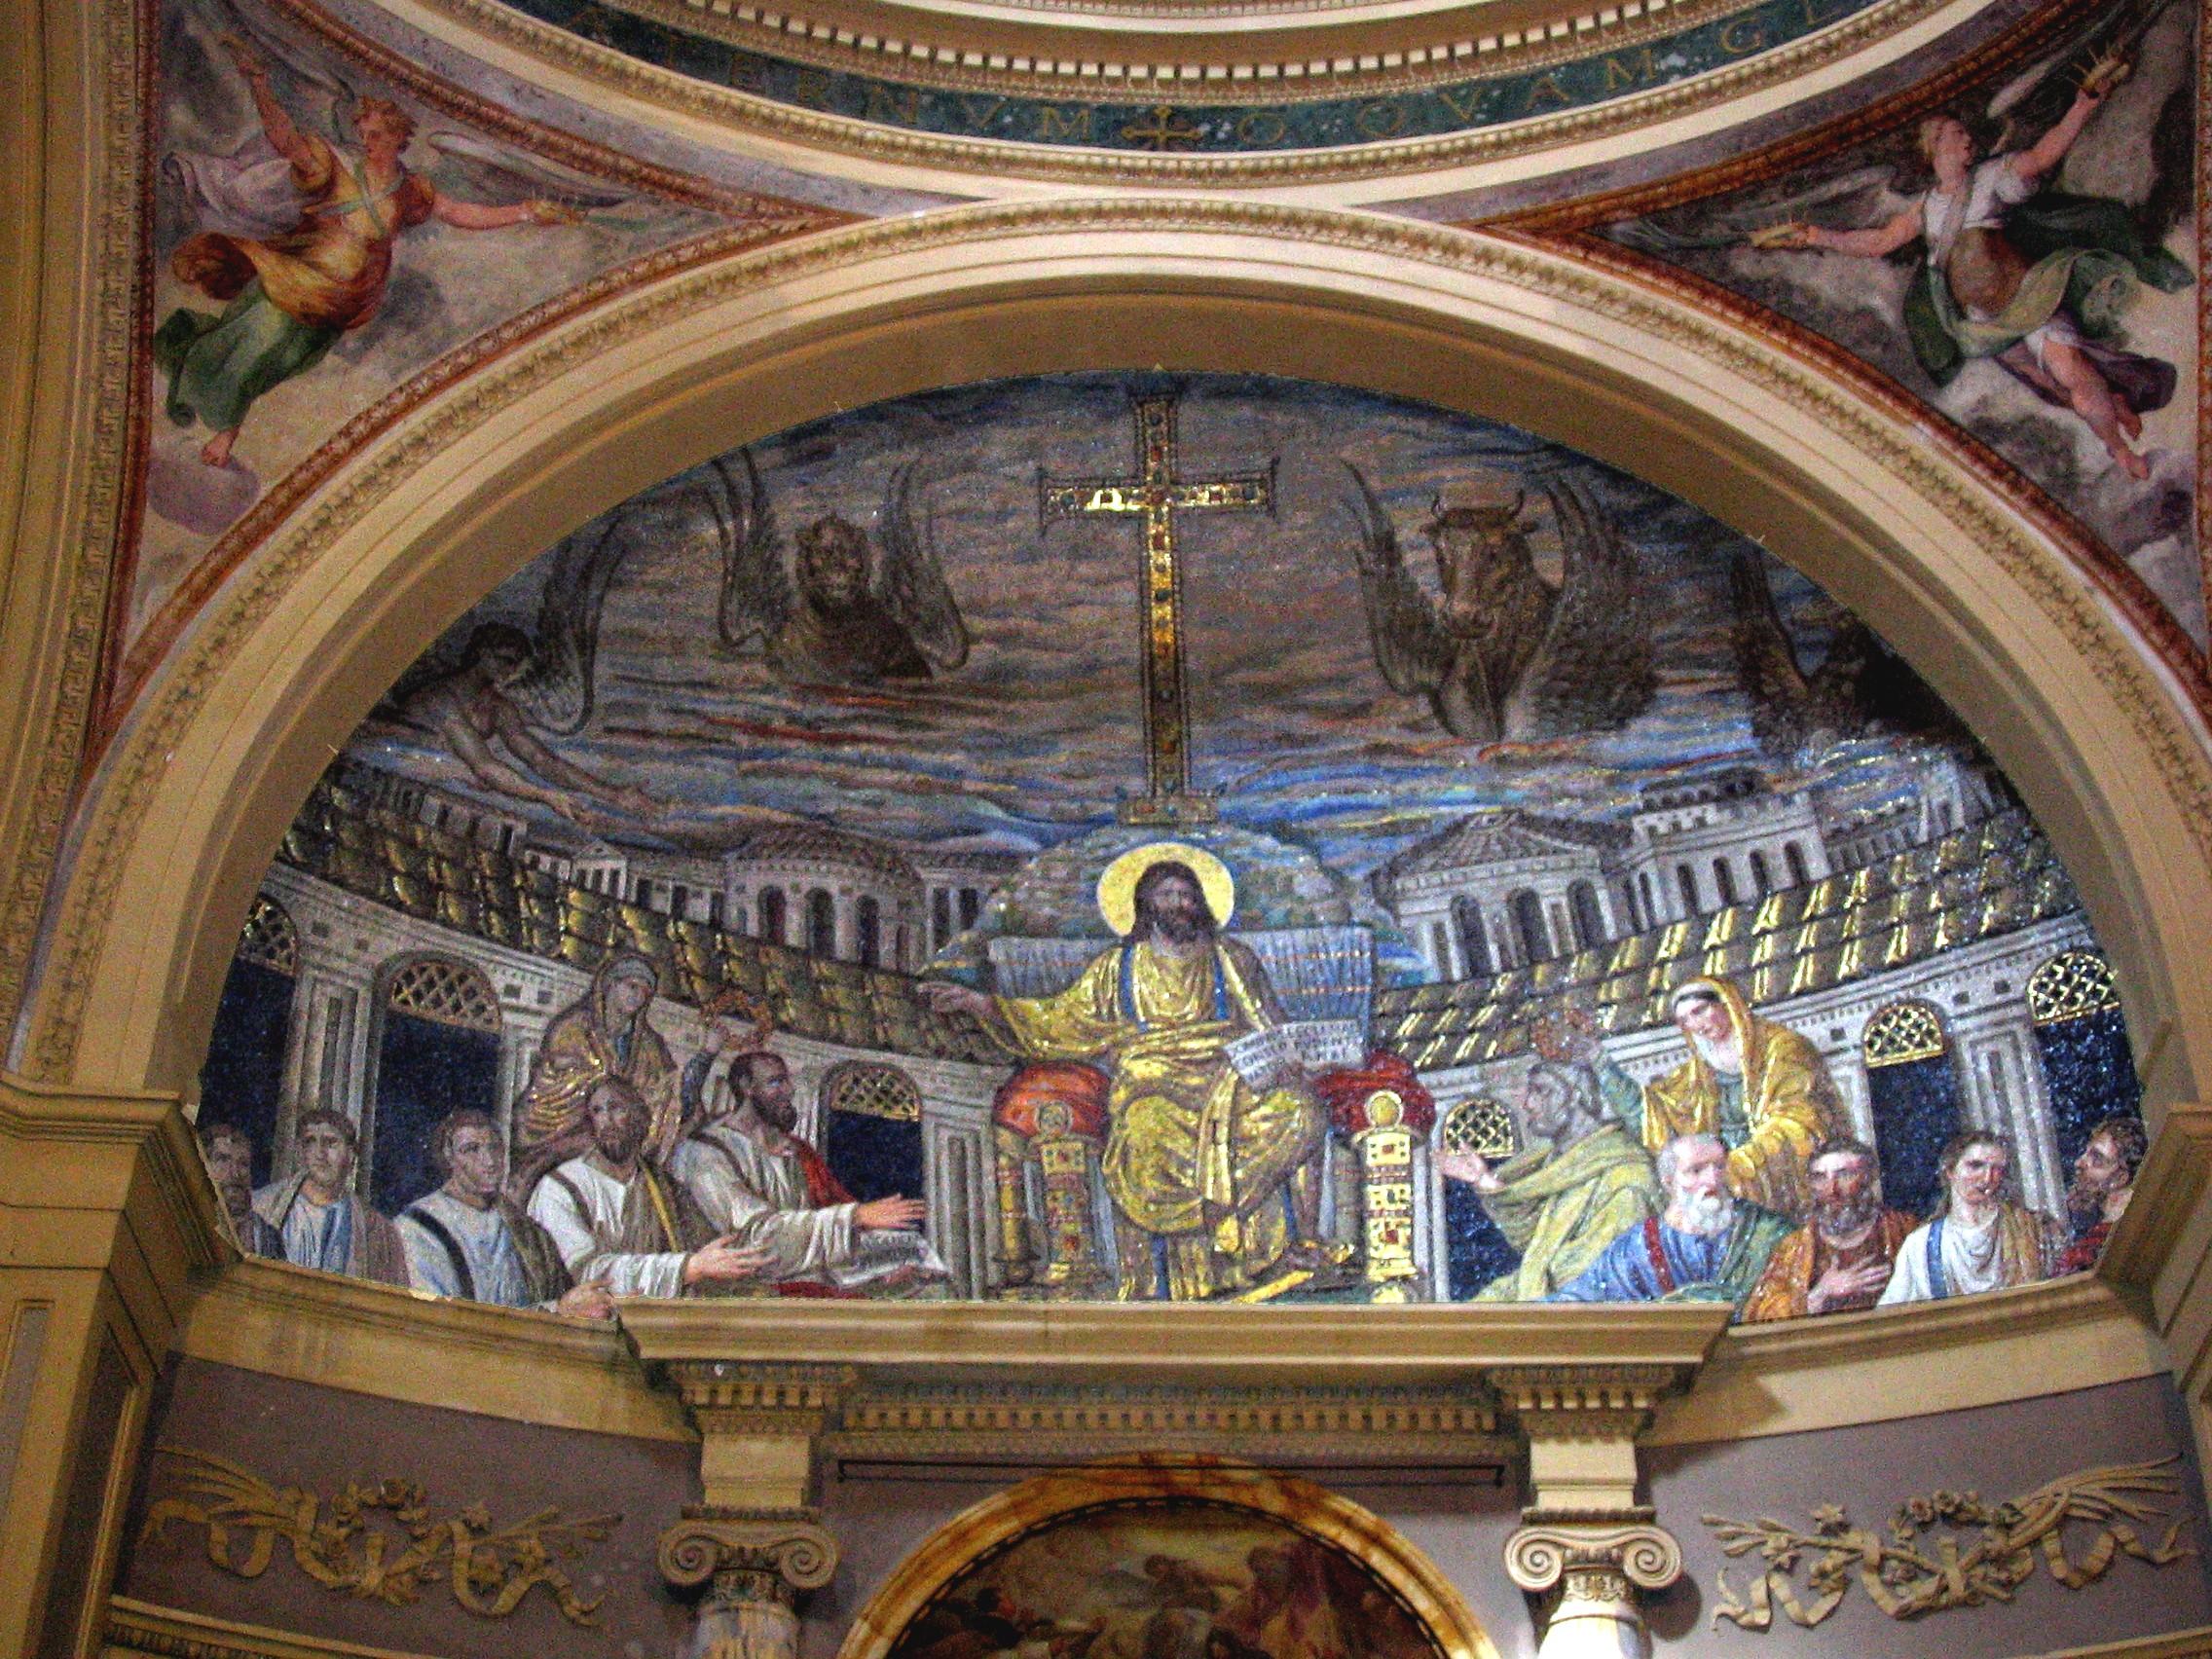 Apse of Santa Pudenziana, Rome. Source: Wikimedia Commons